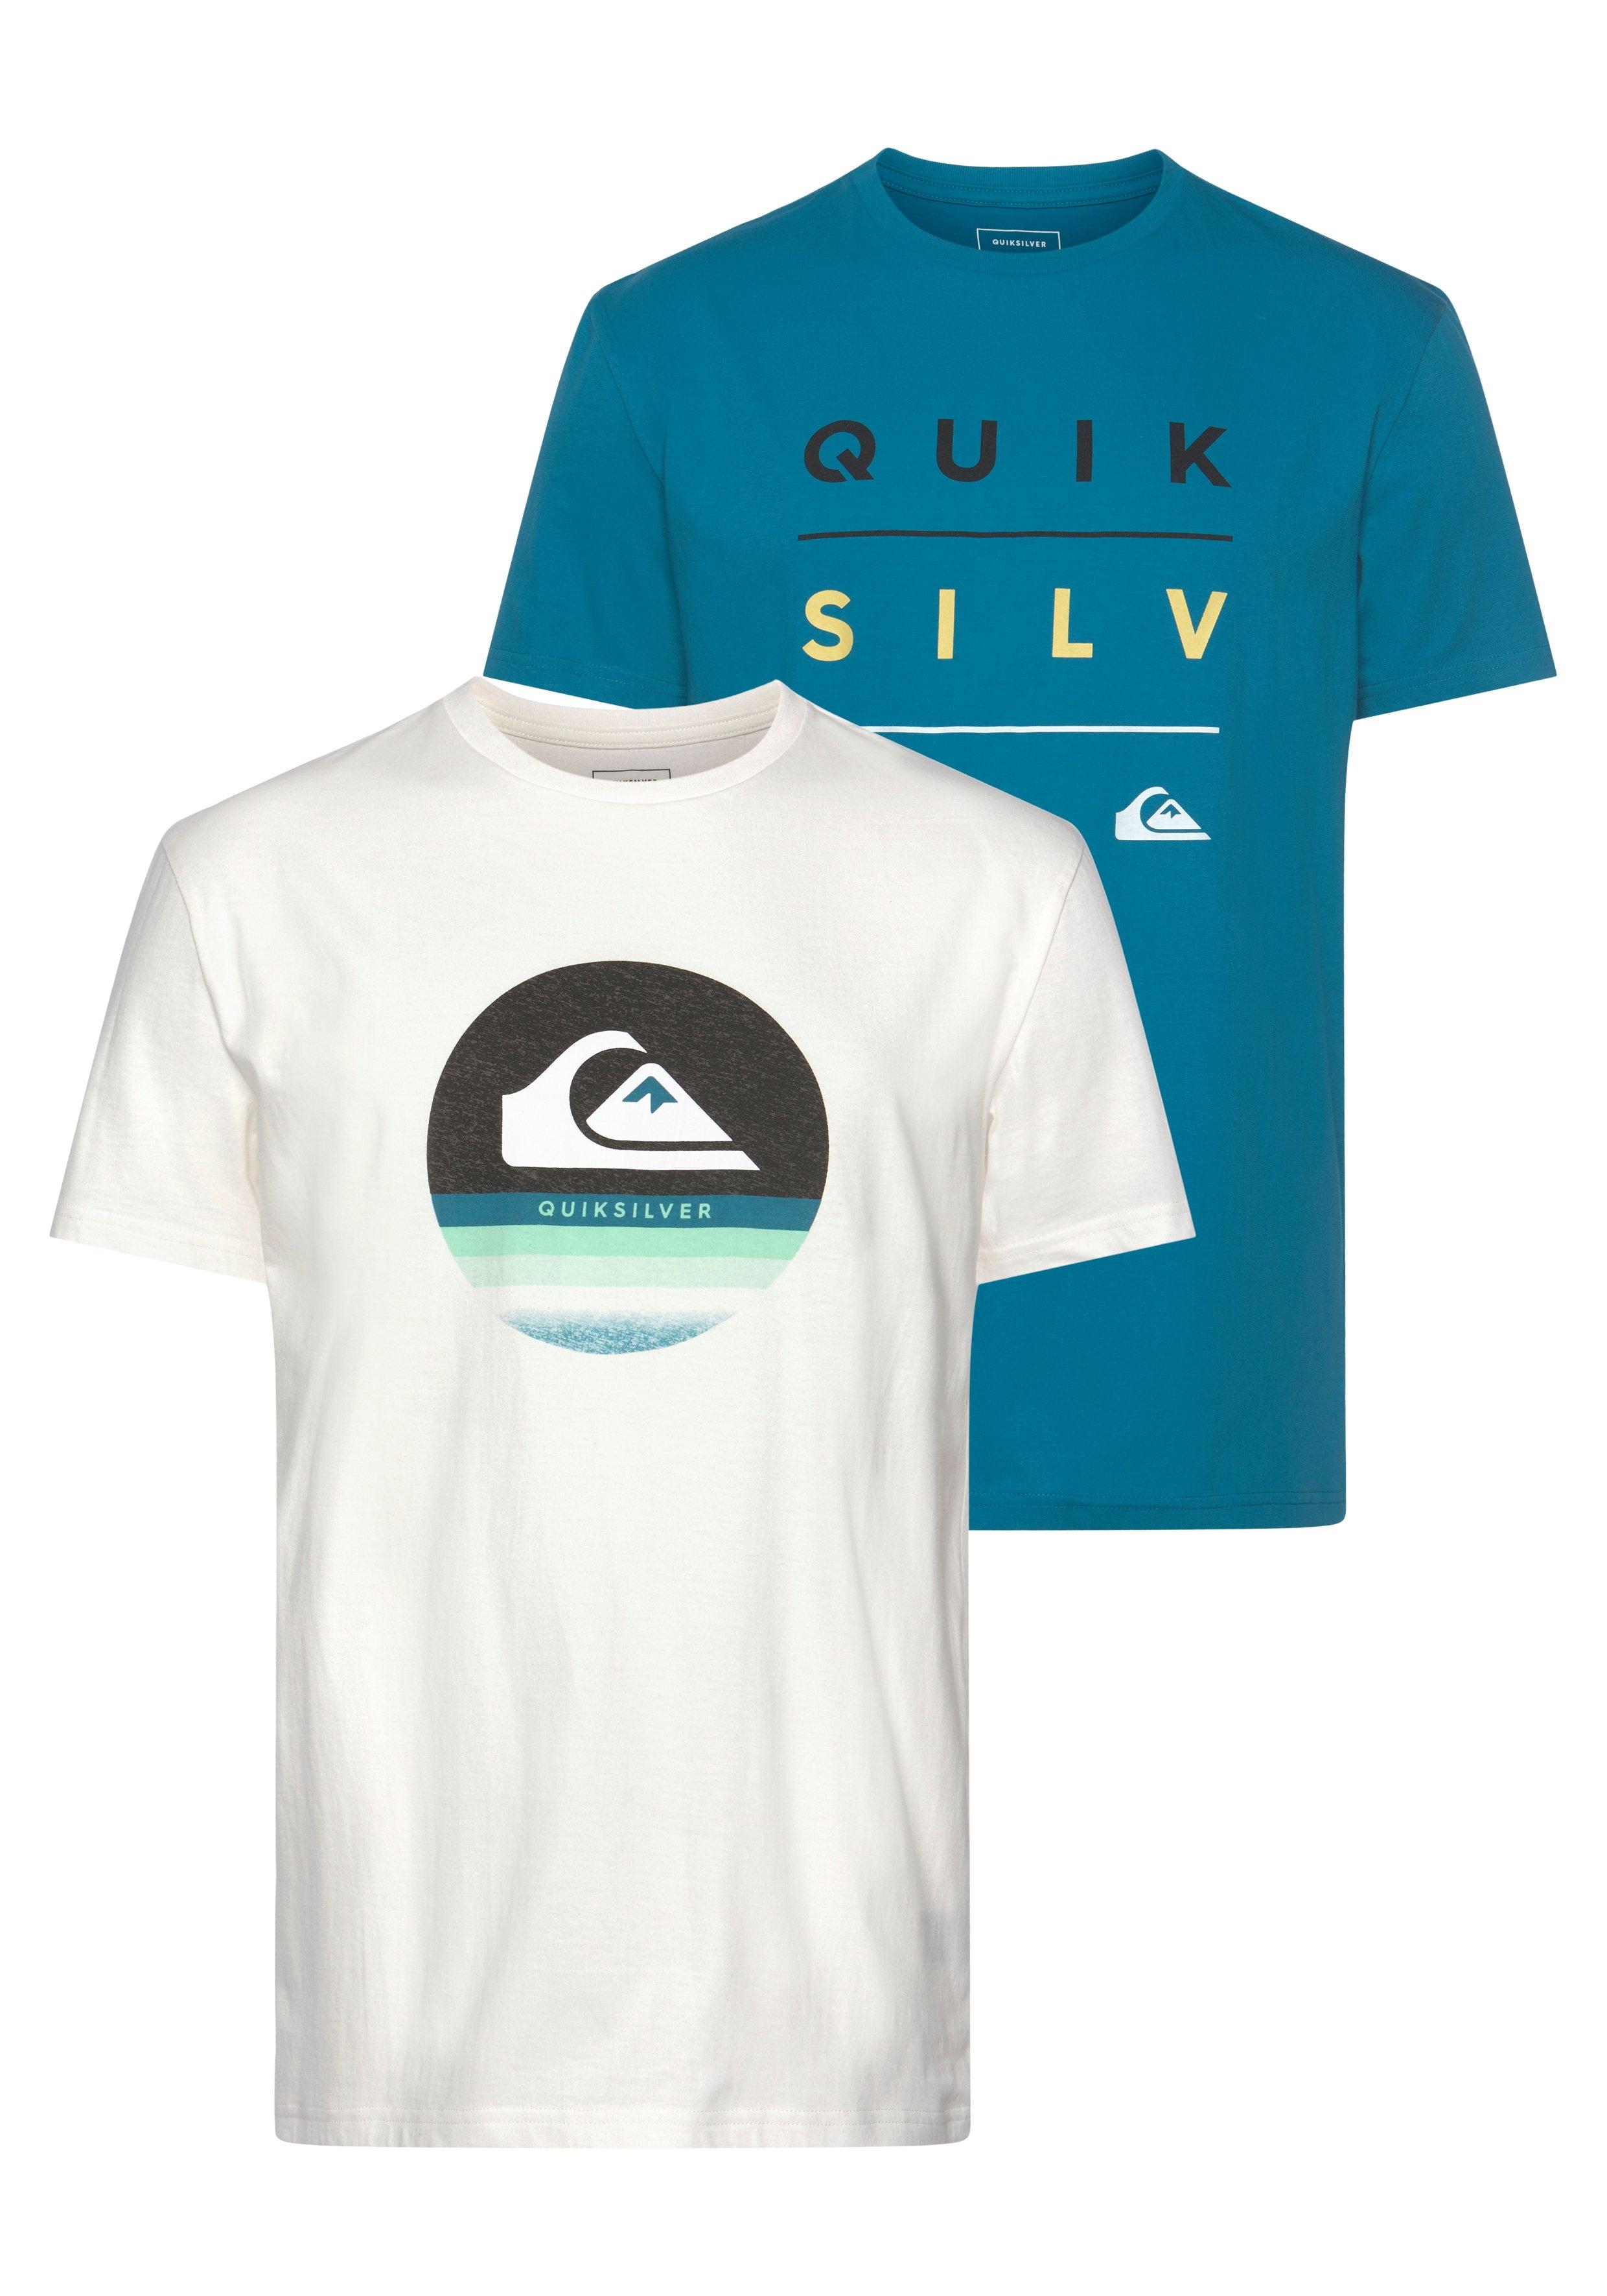 Quiksilver T-shirt »STACK SHIFT FLAXTON PACK« (Set van 2) - verschillende betaalmethodes